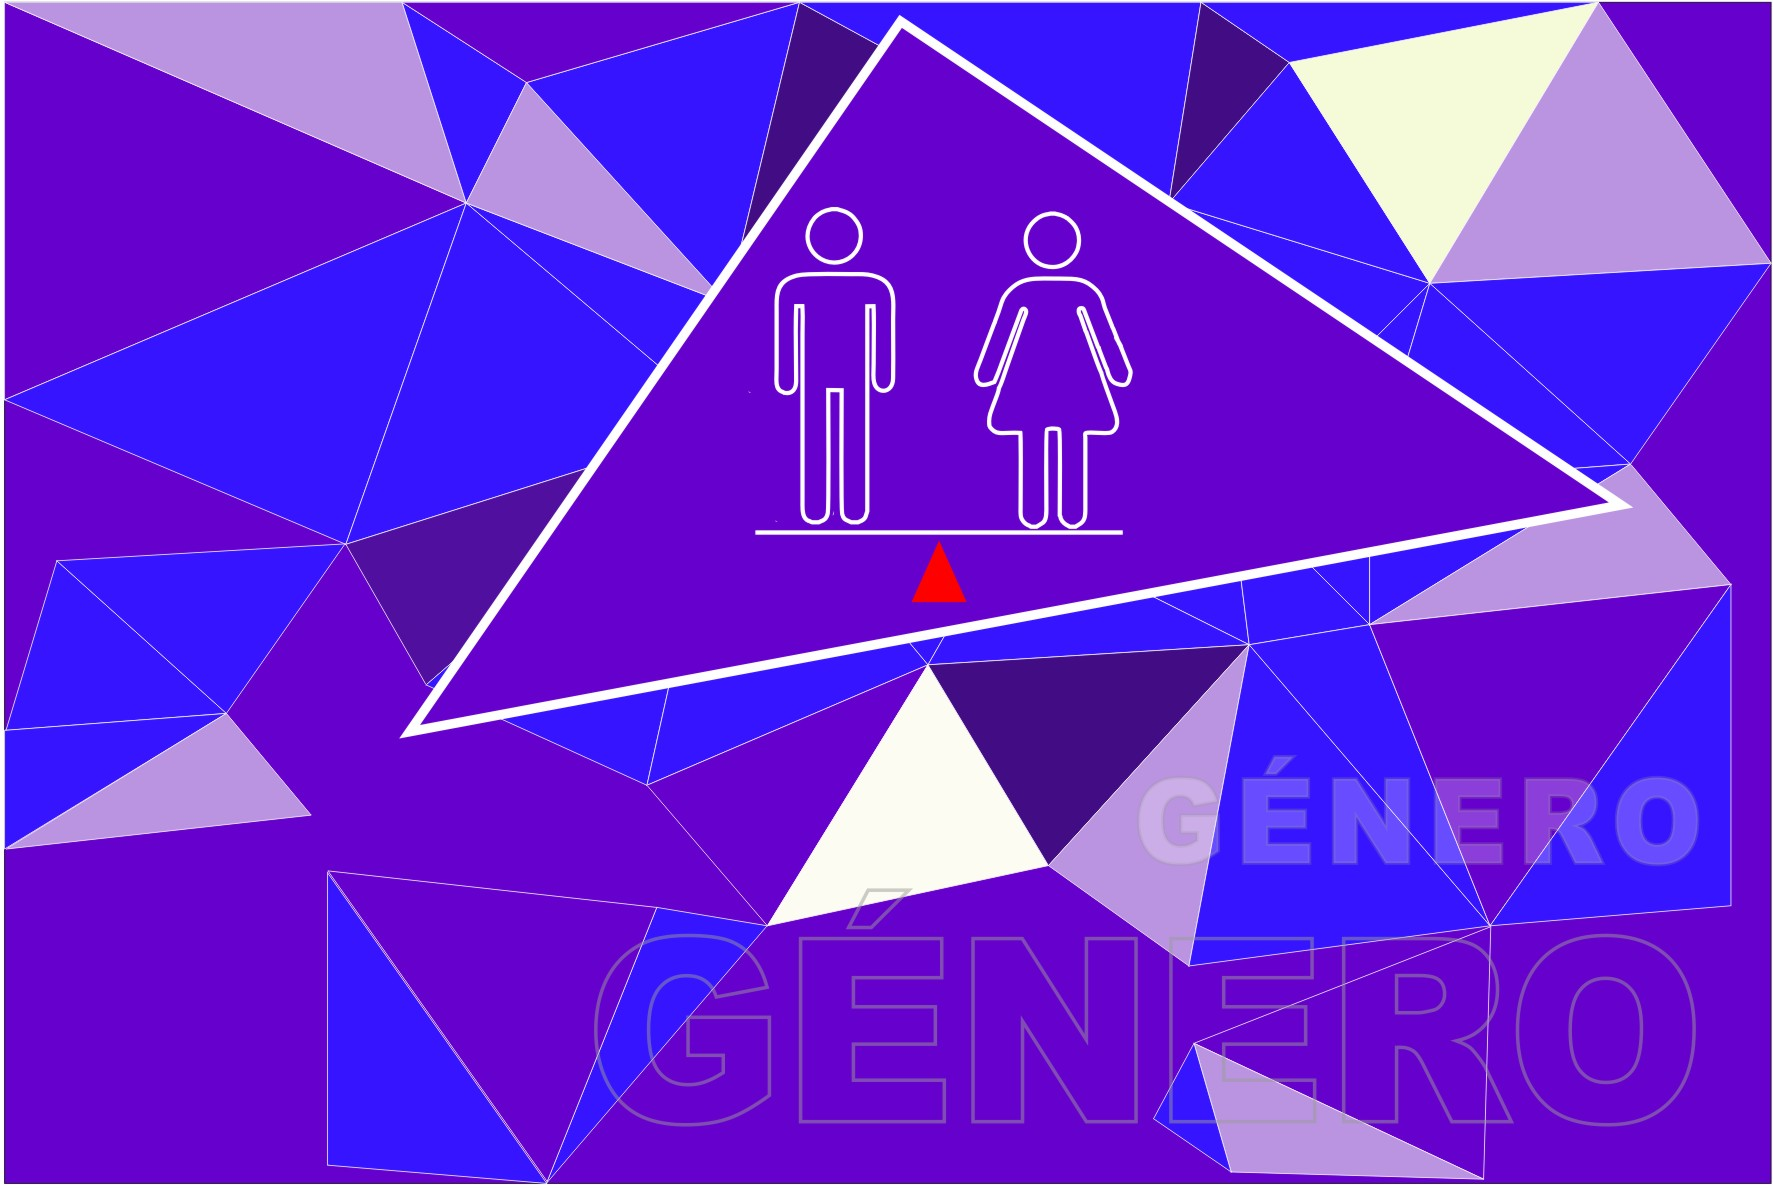 imagen oficina de género